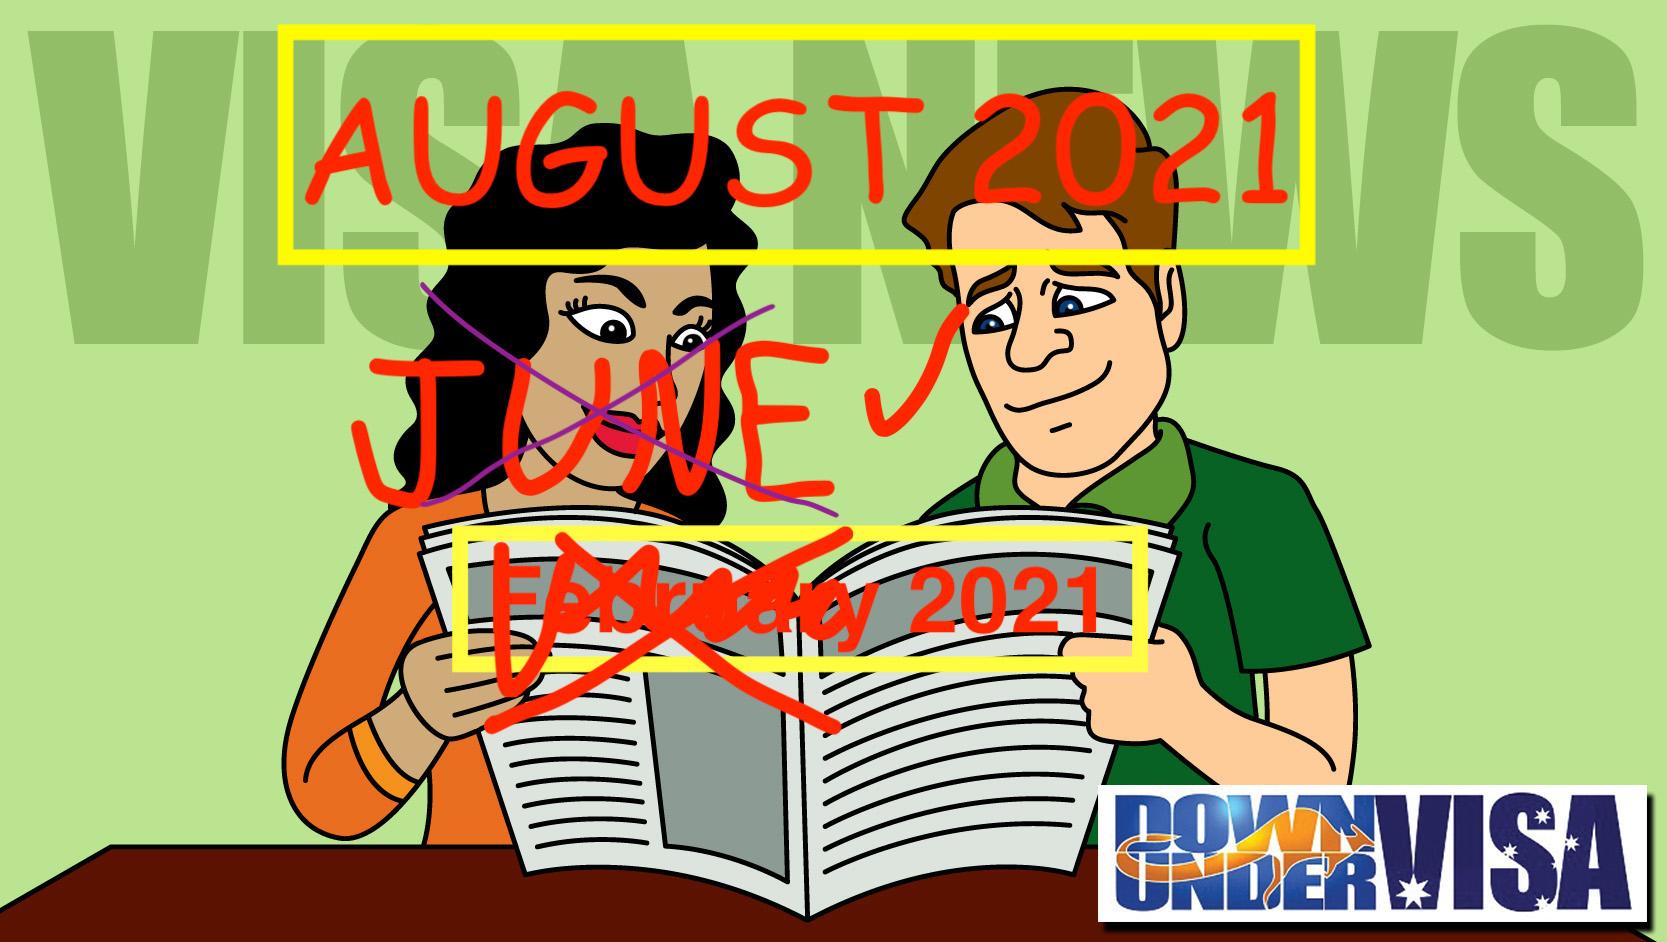 August 2021 Down Under Visa News Online Weddings and Offshore Partner Visas